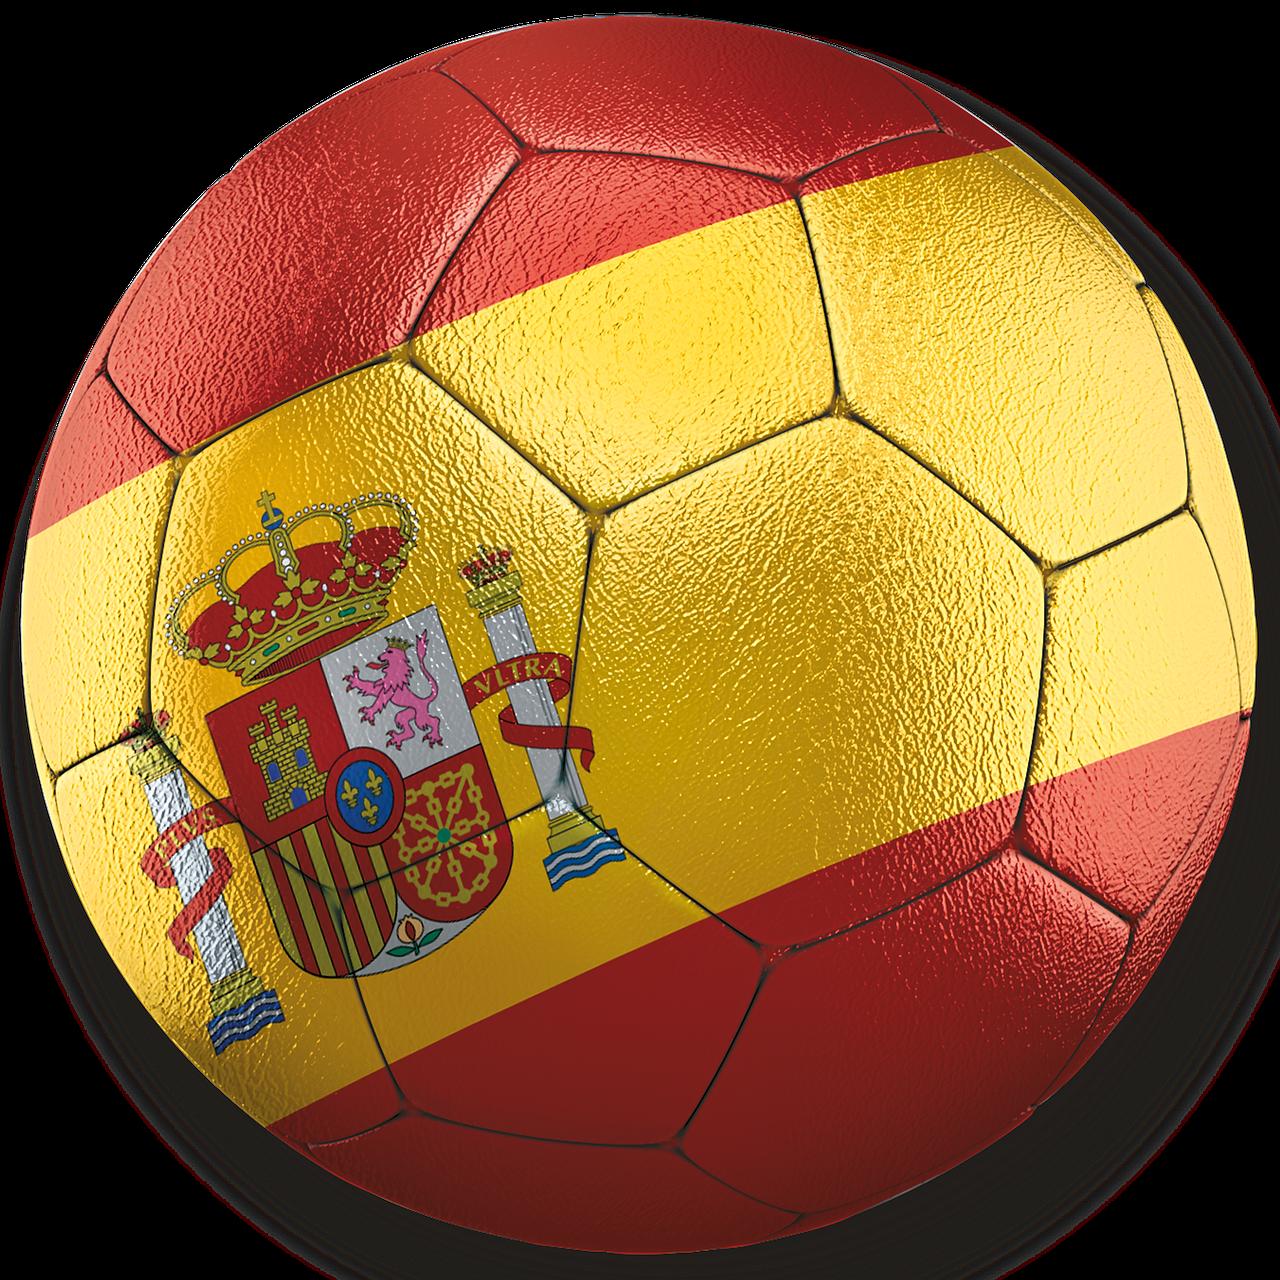 football-4923037_1280